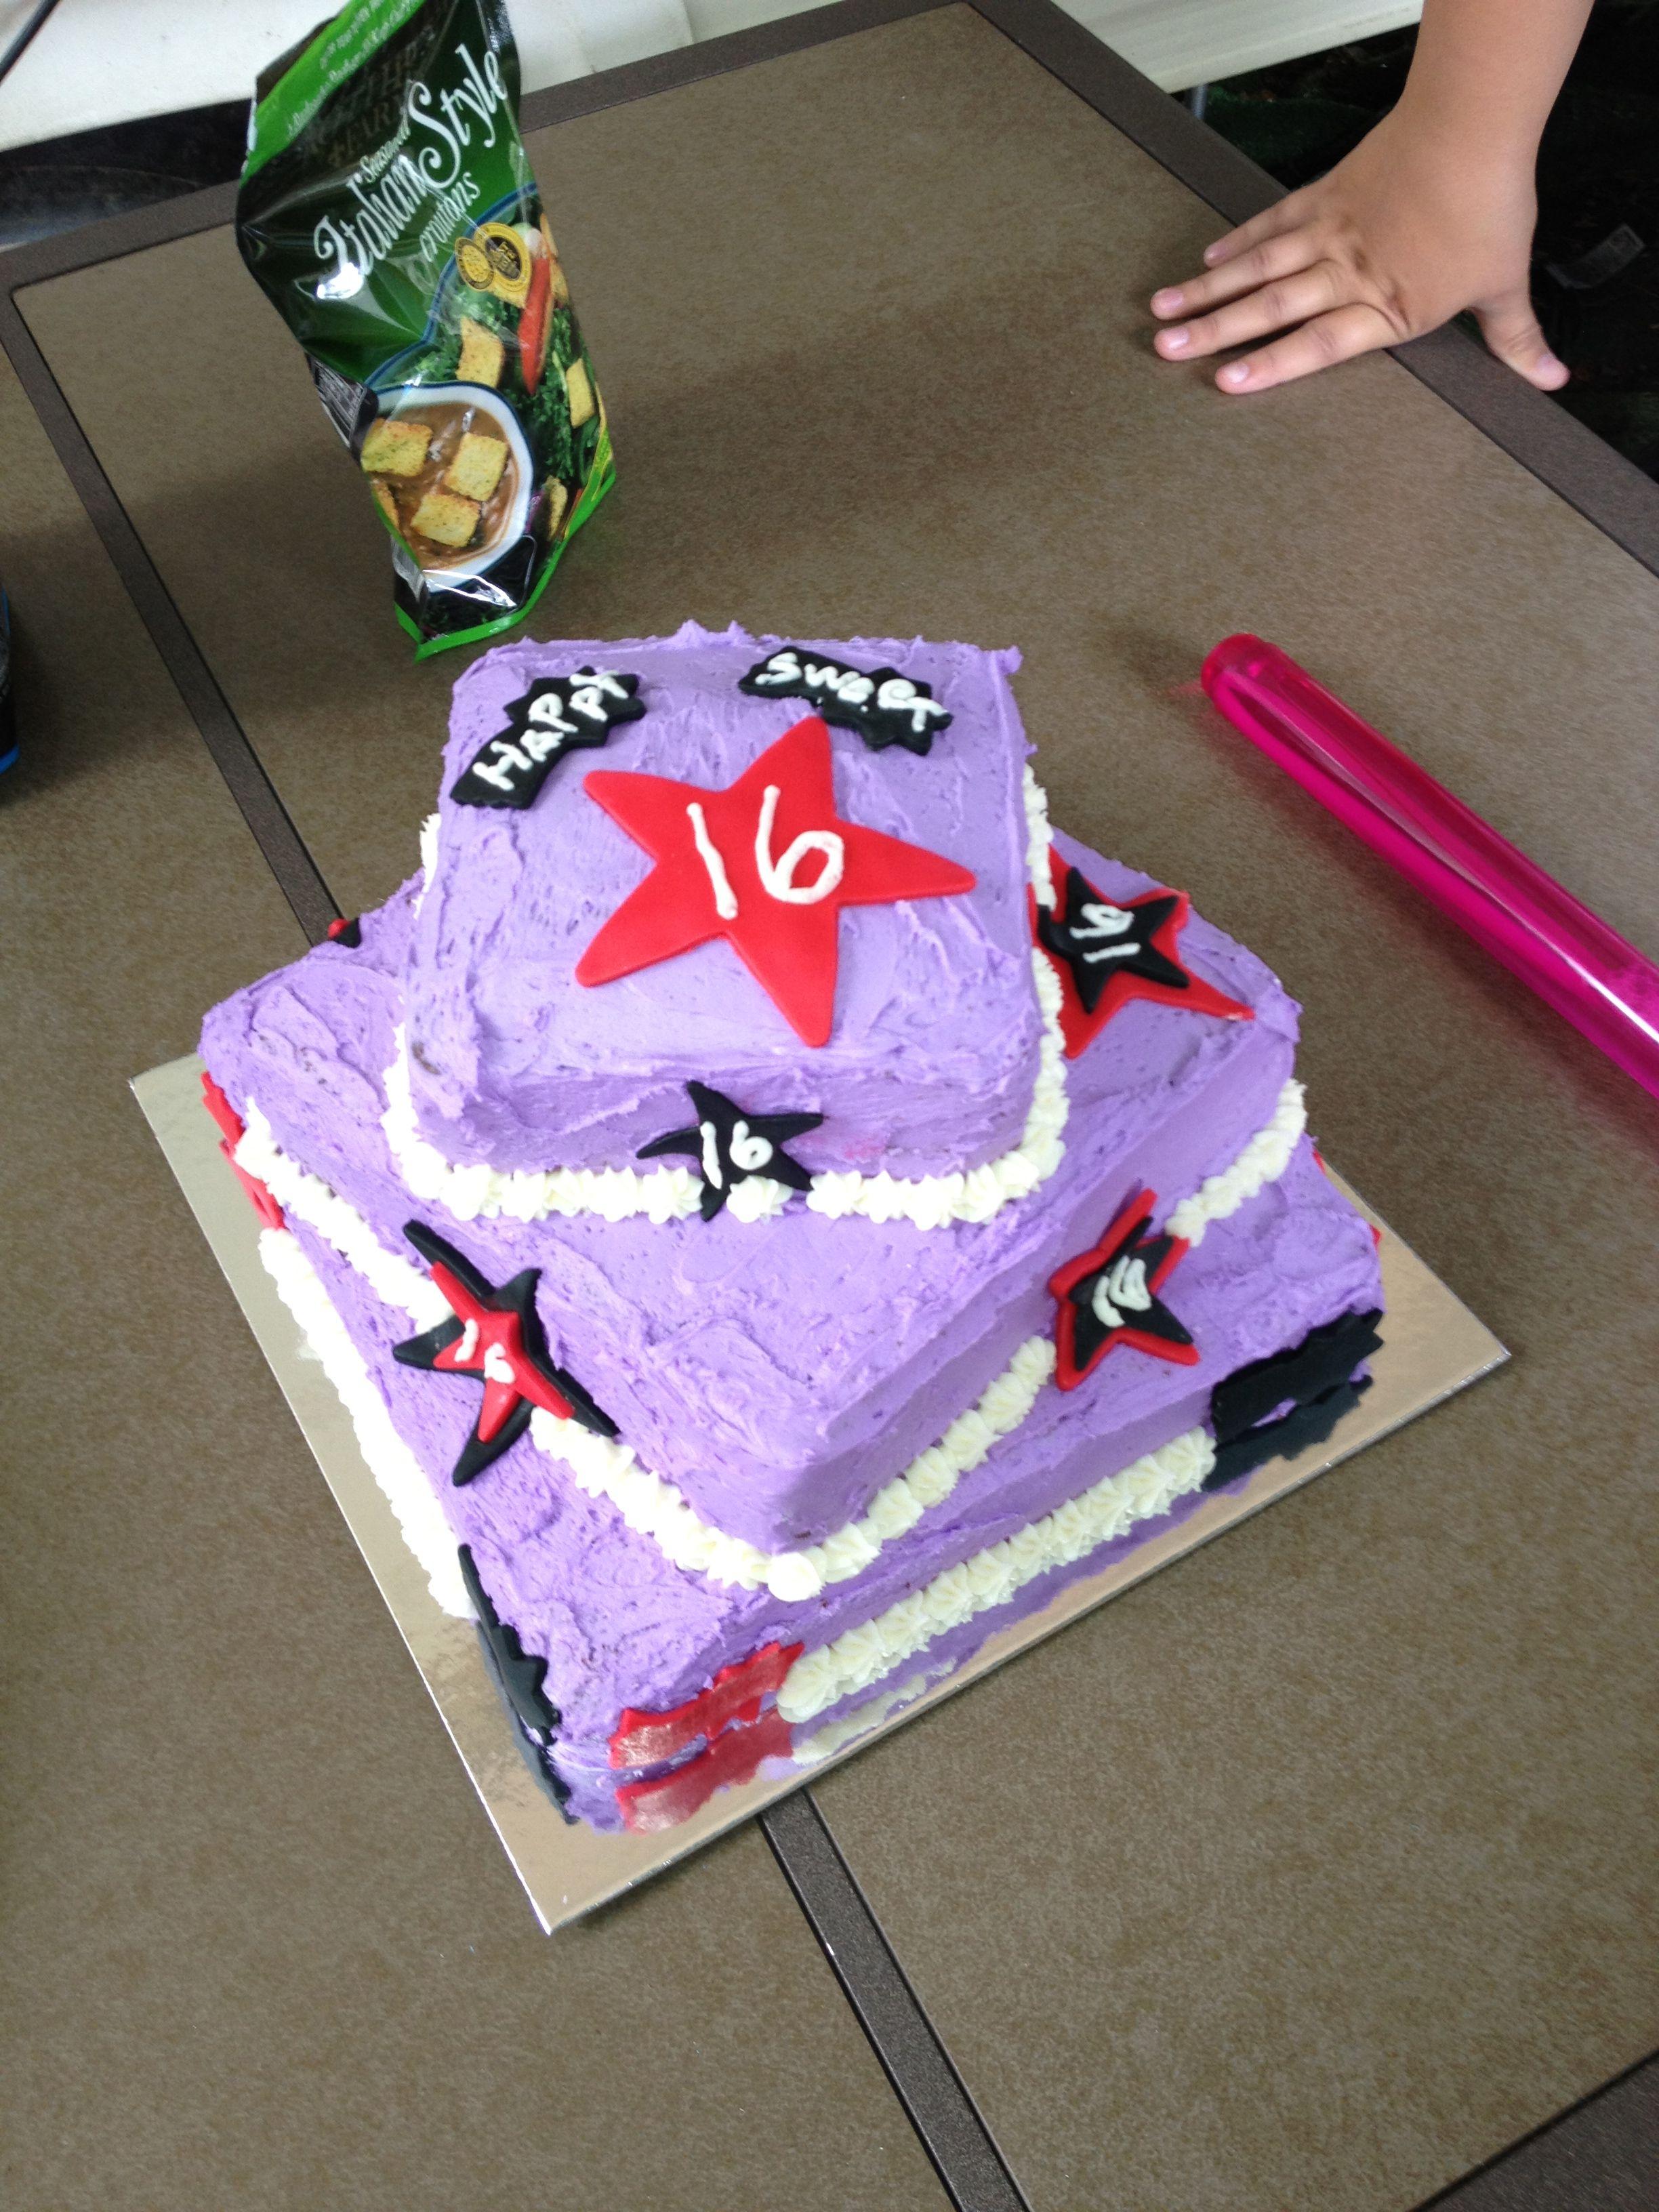 16th Birthday Cake 16th Birthday Party Ideas Pinterest